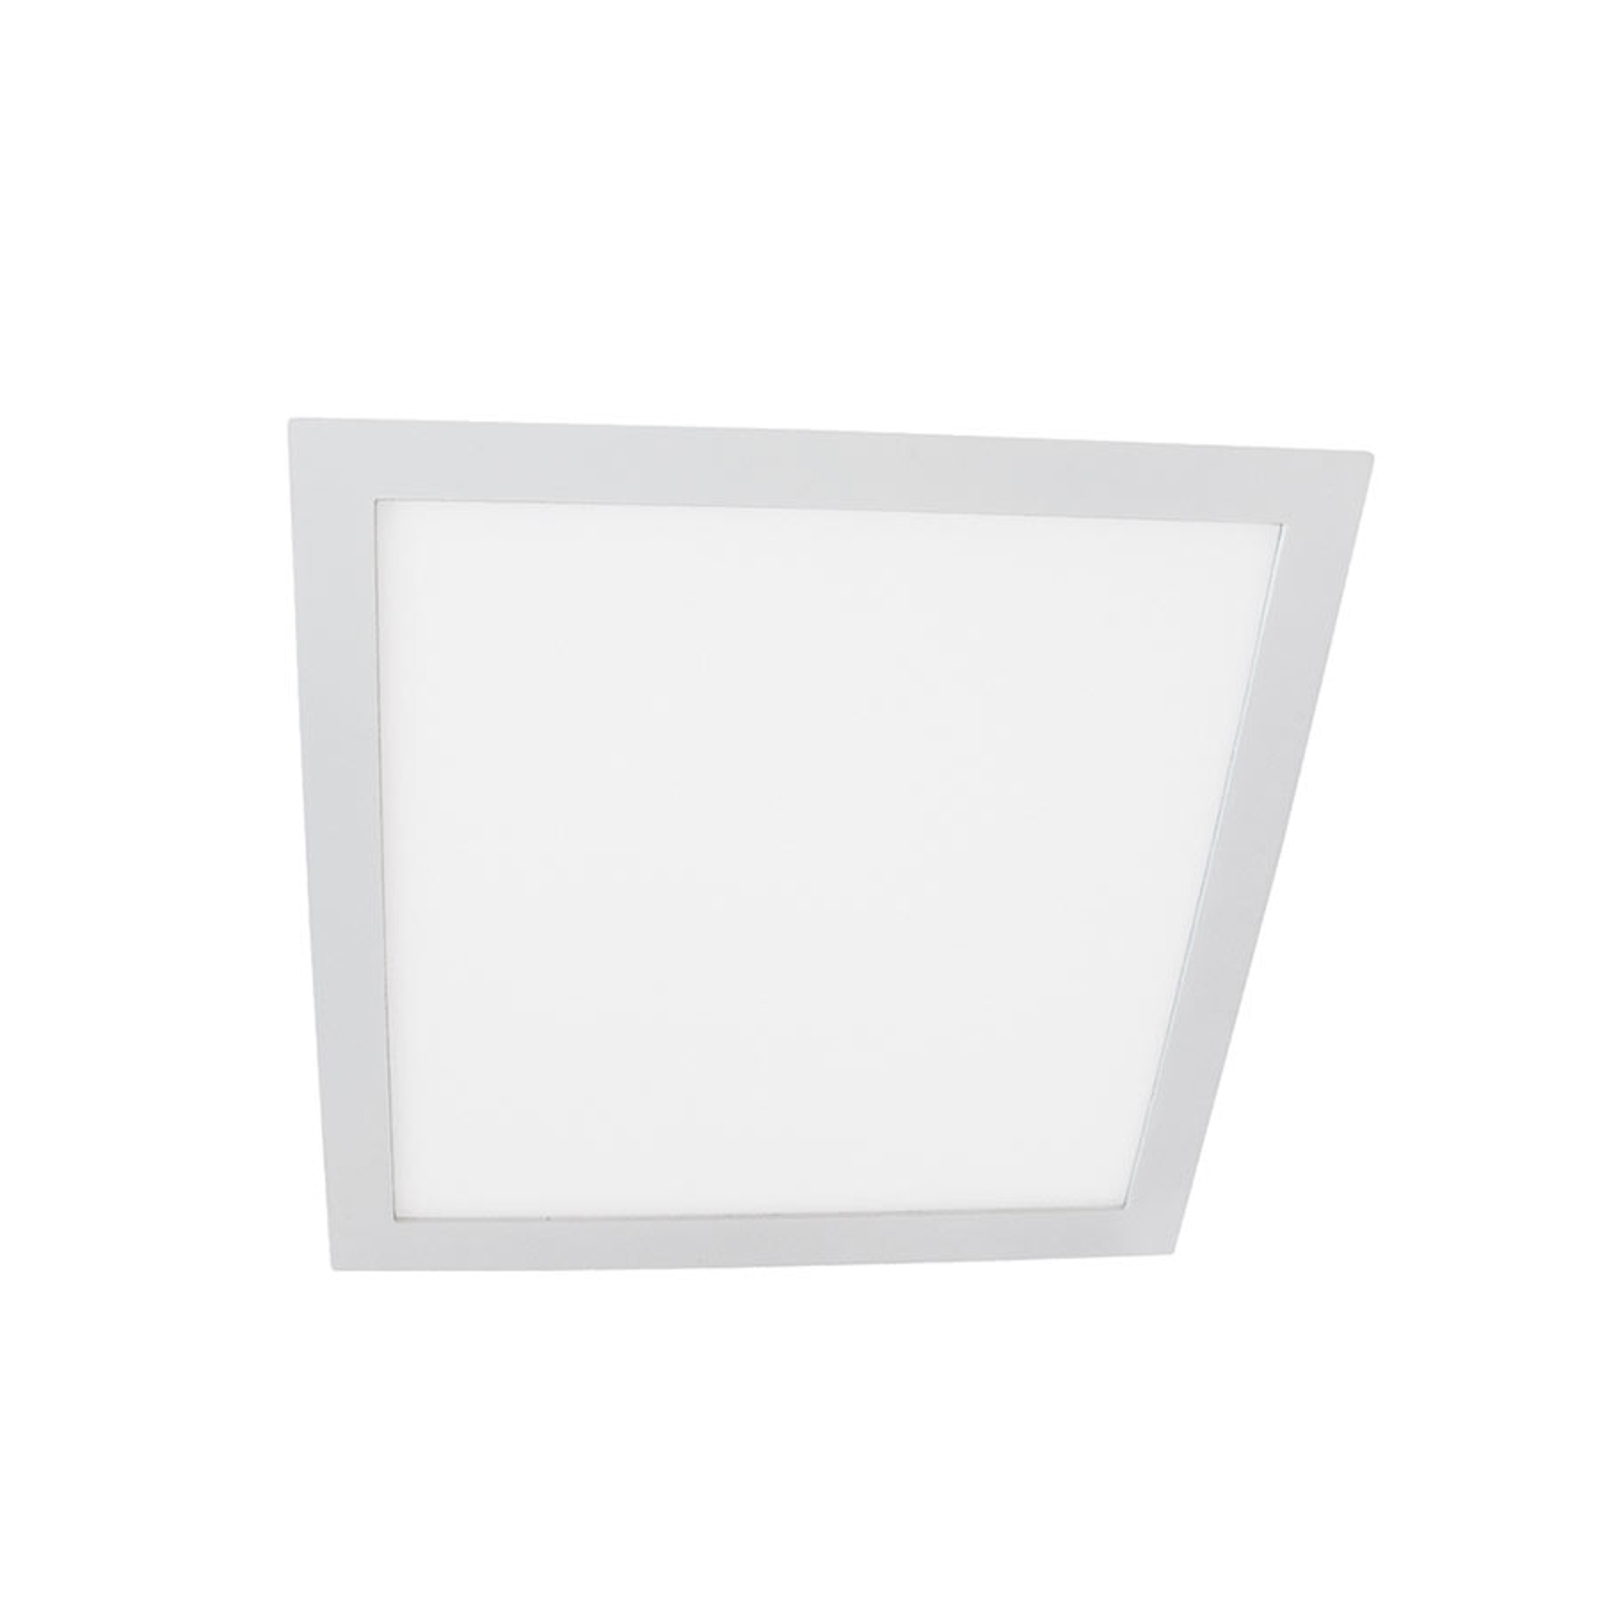 Moon Square LED-Einbauleuchte 6W, 4.000K